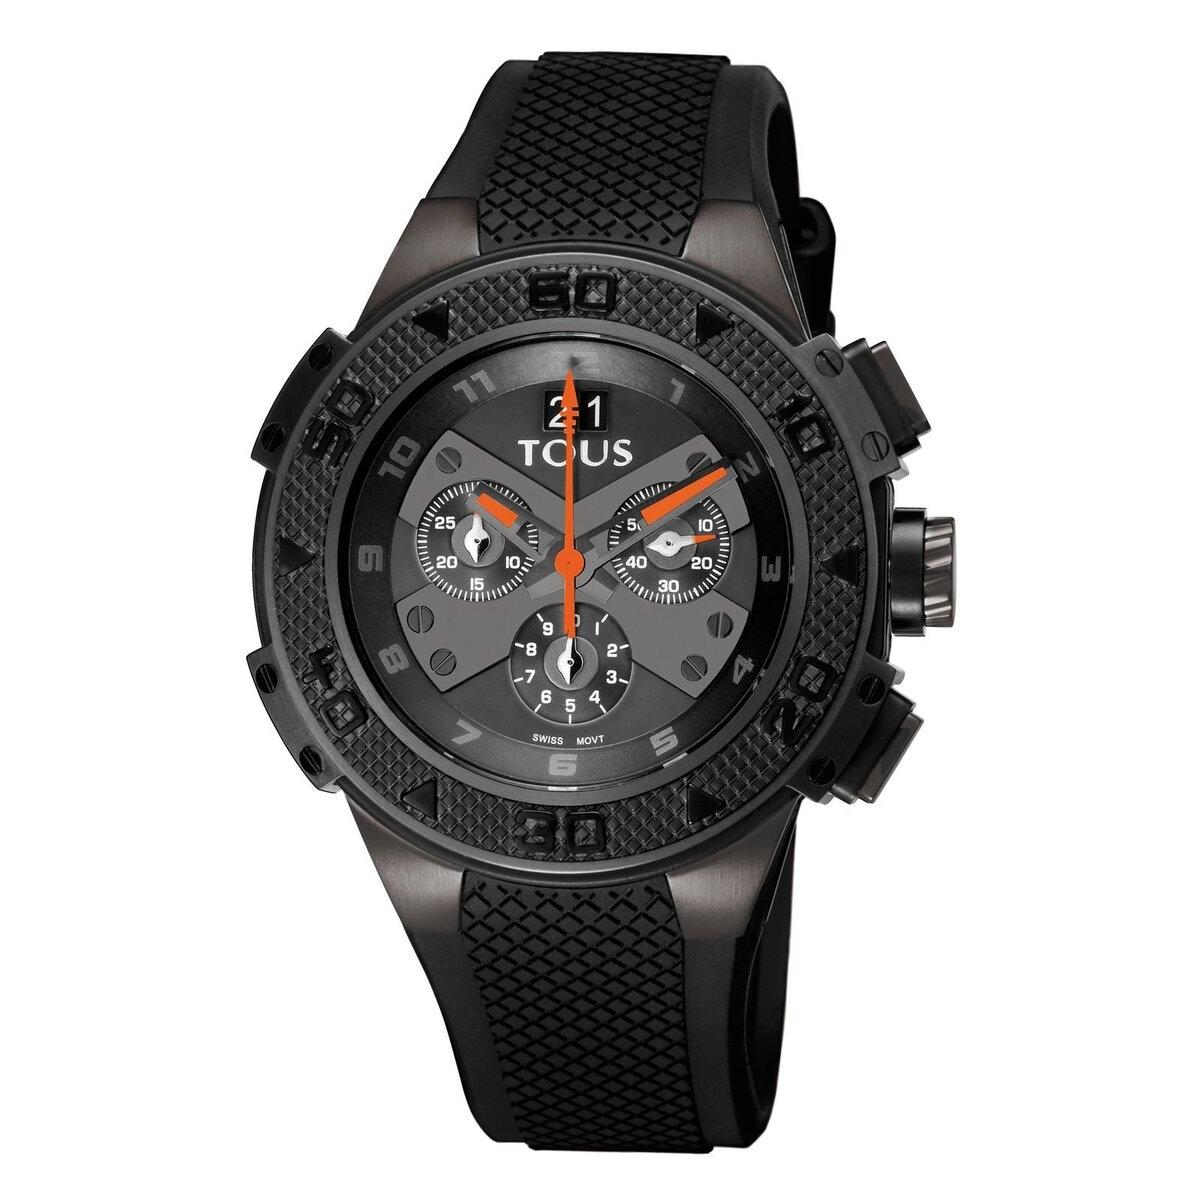 Reloj Xtous bicolor de acero/IP negro con correa de silicona negra